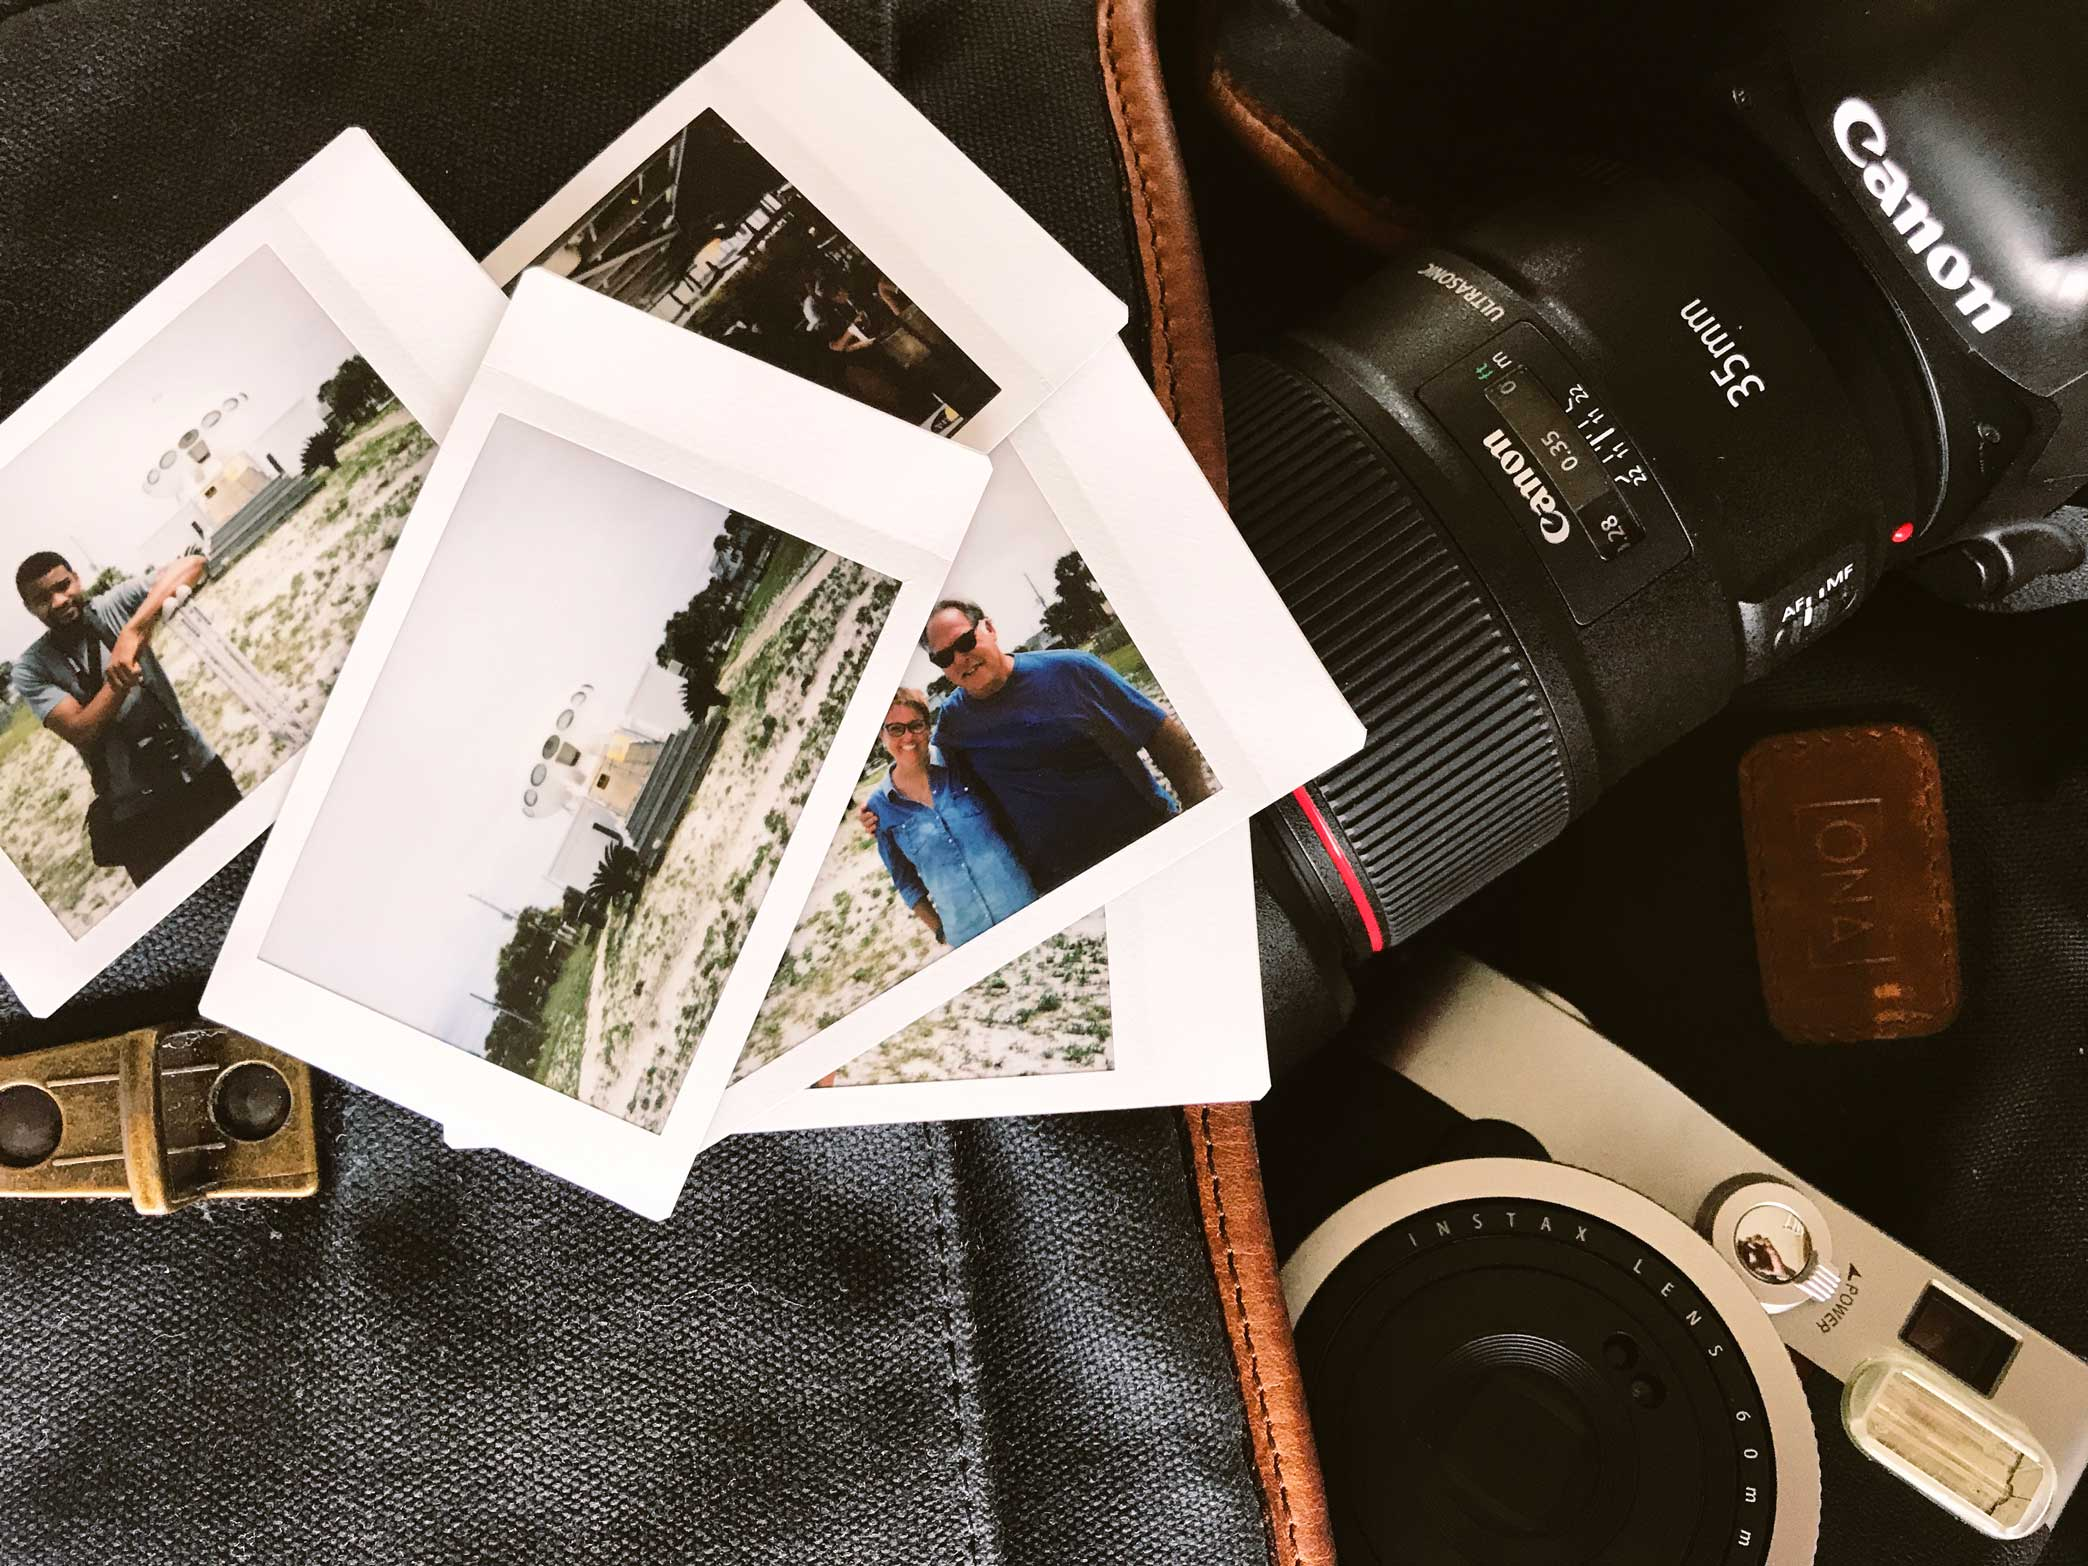 Ona Bag, Canon 5D Mark IV, and Fujifilm Instax Mini 90.